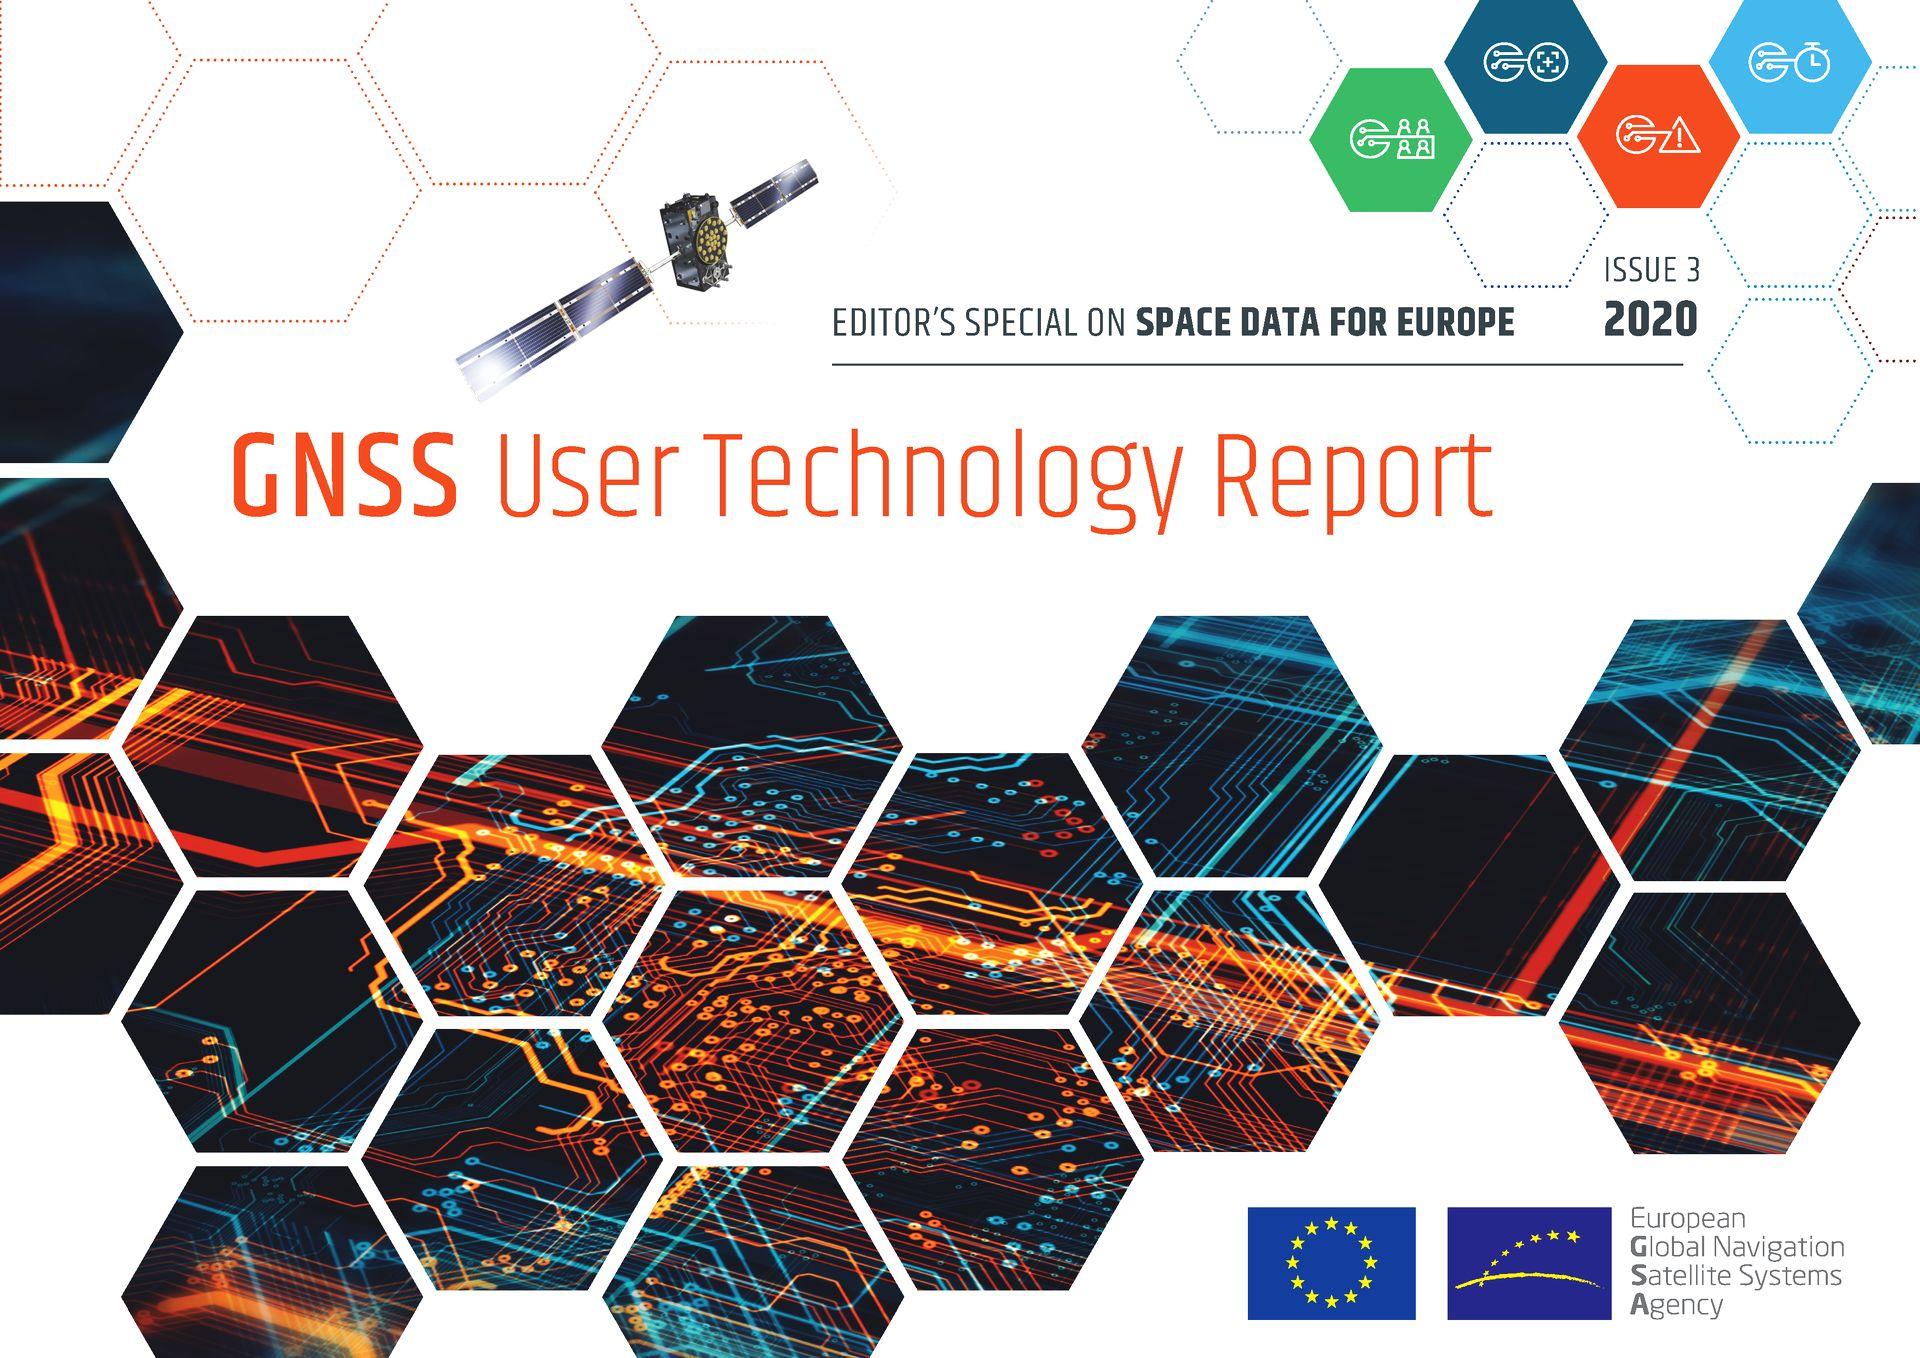 obalka-gsa-gnss-technology-report-2020